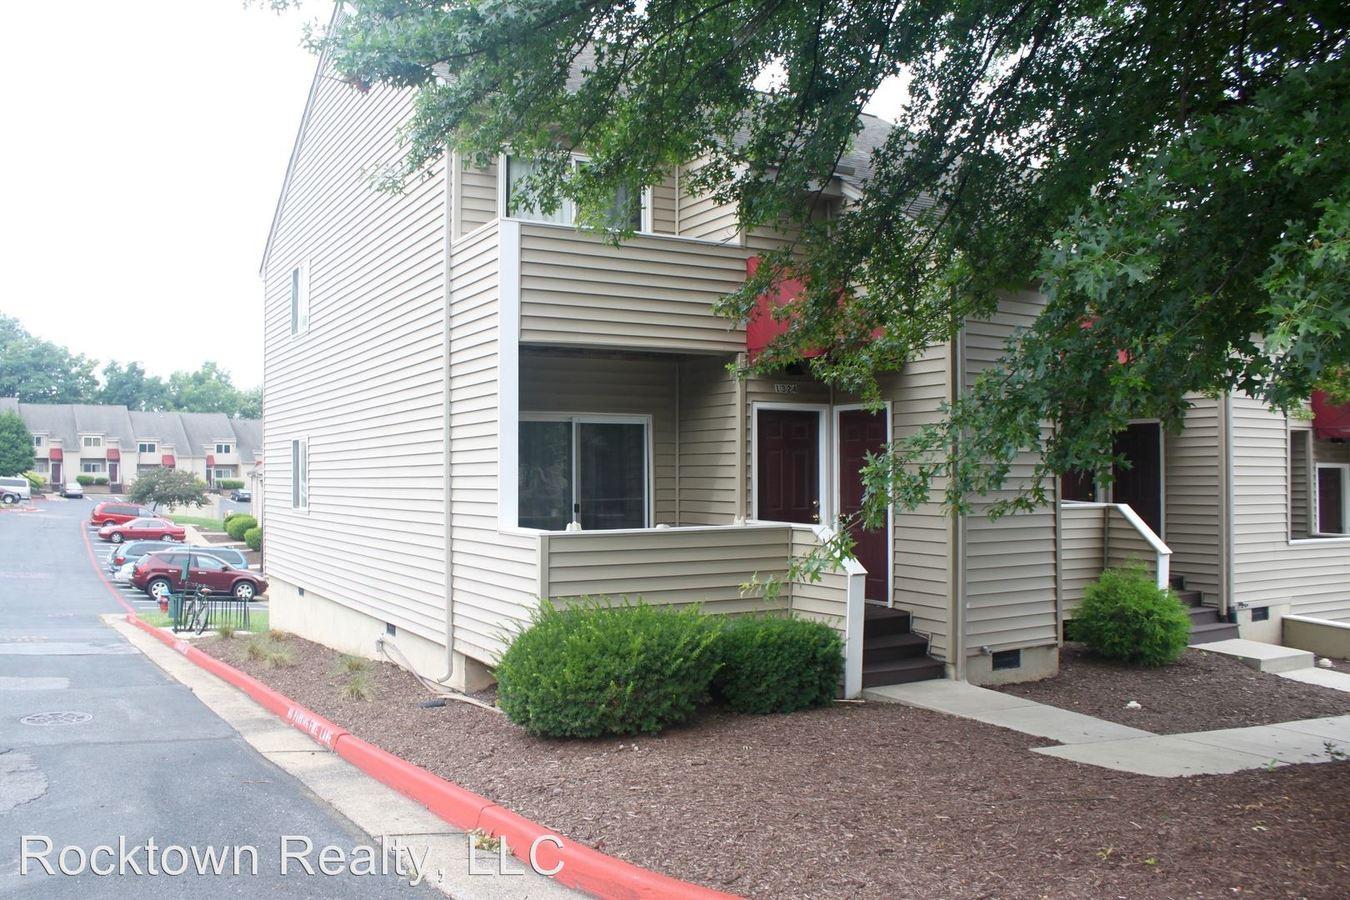 4 Bedrooms 2 Bathrooms Apartment for rent at 1324 Bradley Drive in Harrisonburg, VA